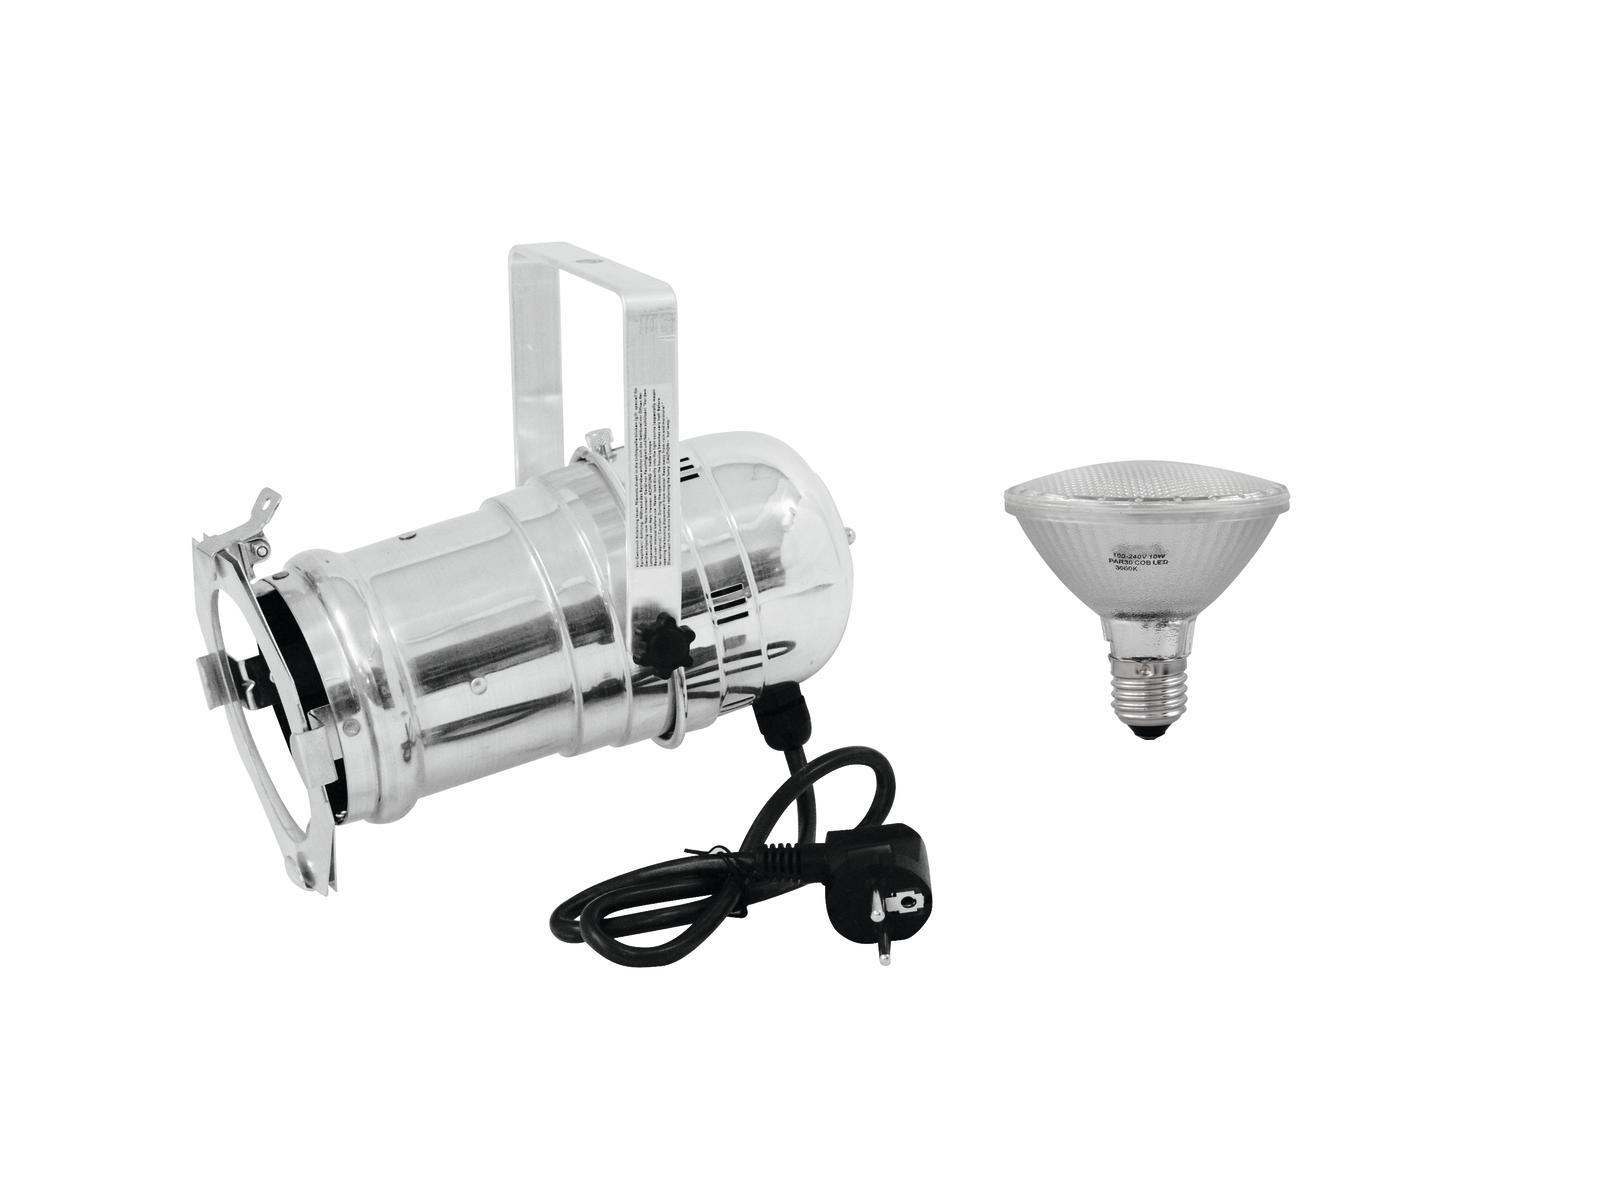 eurolite-set-par-30-spot-sil-par-30-230v-smd-11w-e-27-led-3000